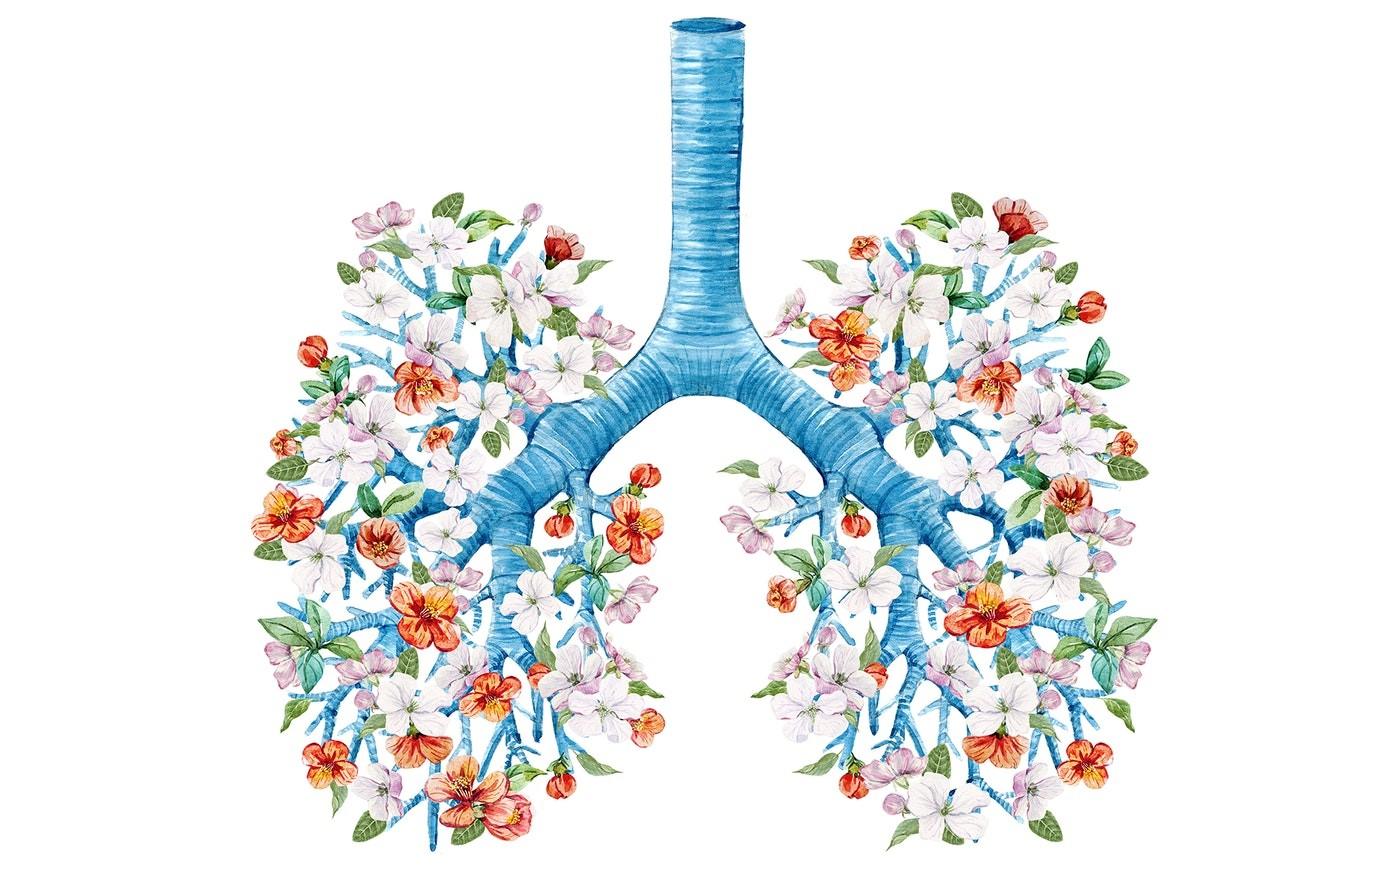 hannah waldman yoga teacher hove lungs breathing